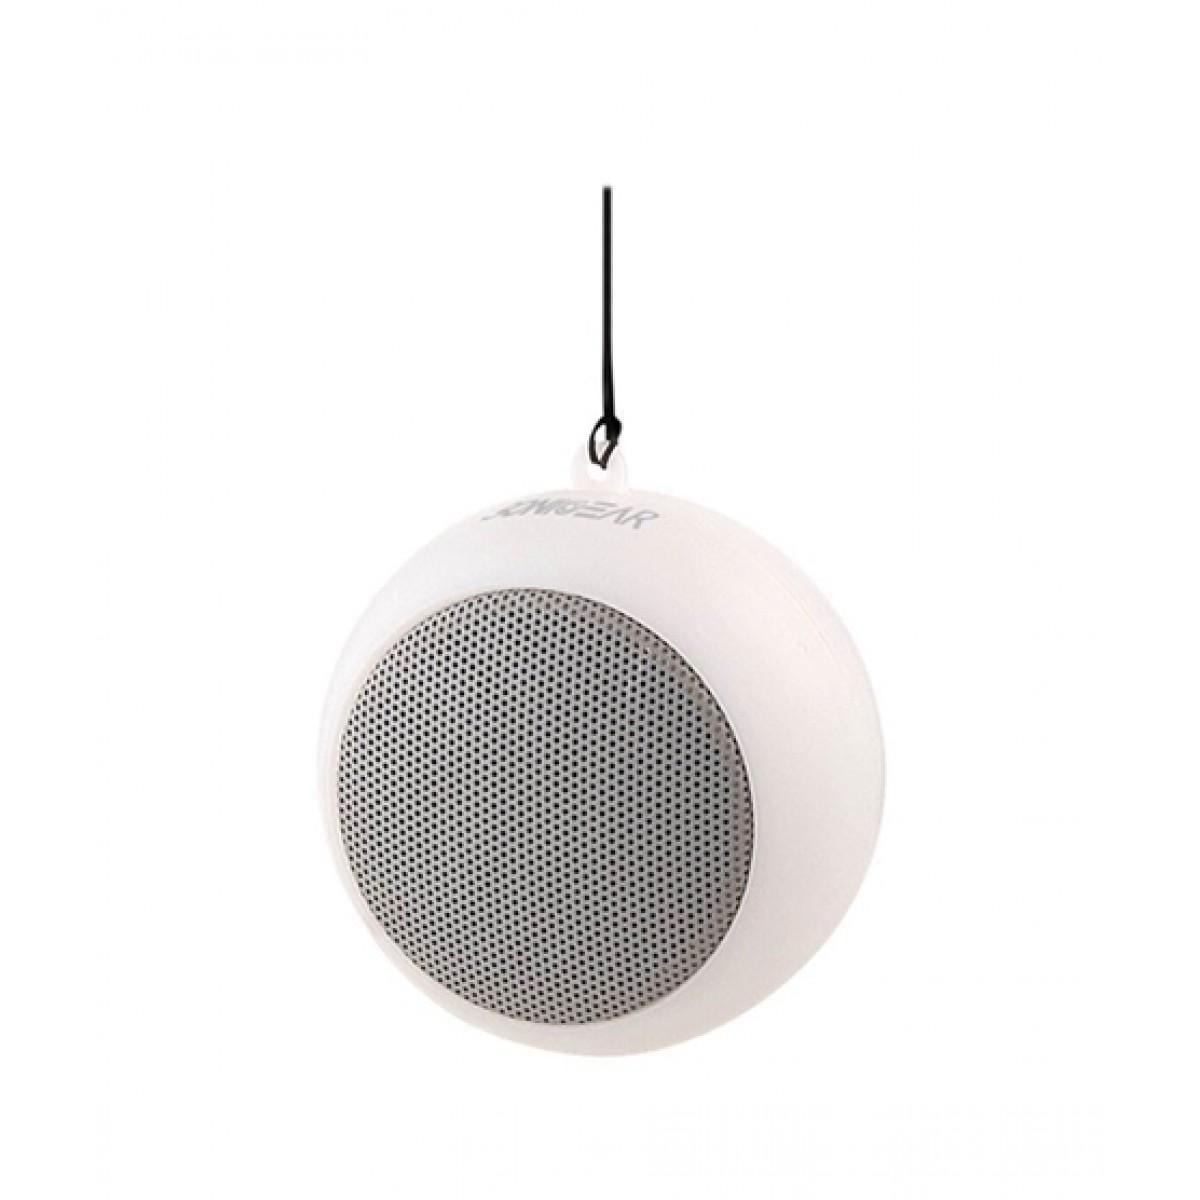 SonicGear Pandora Lumo 2 Bluetooth Wireless Speakers Grey